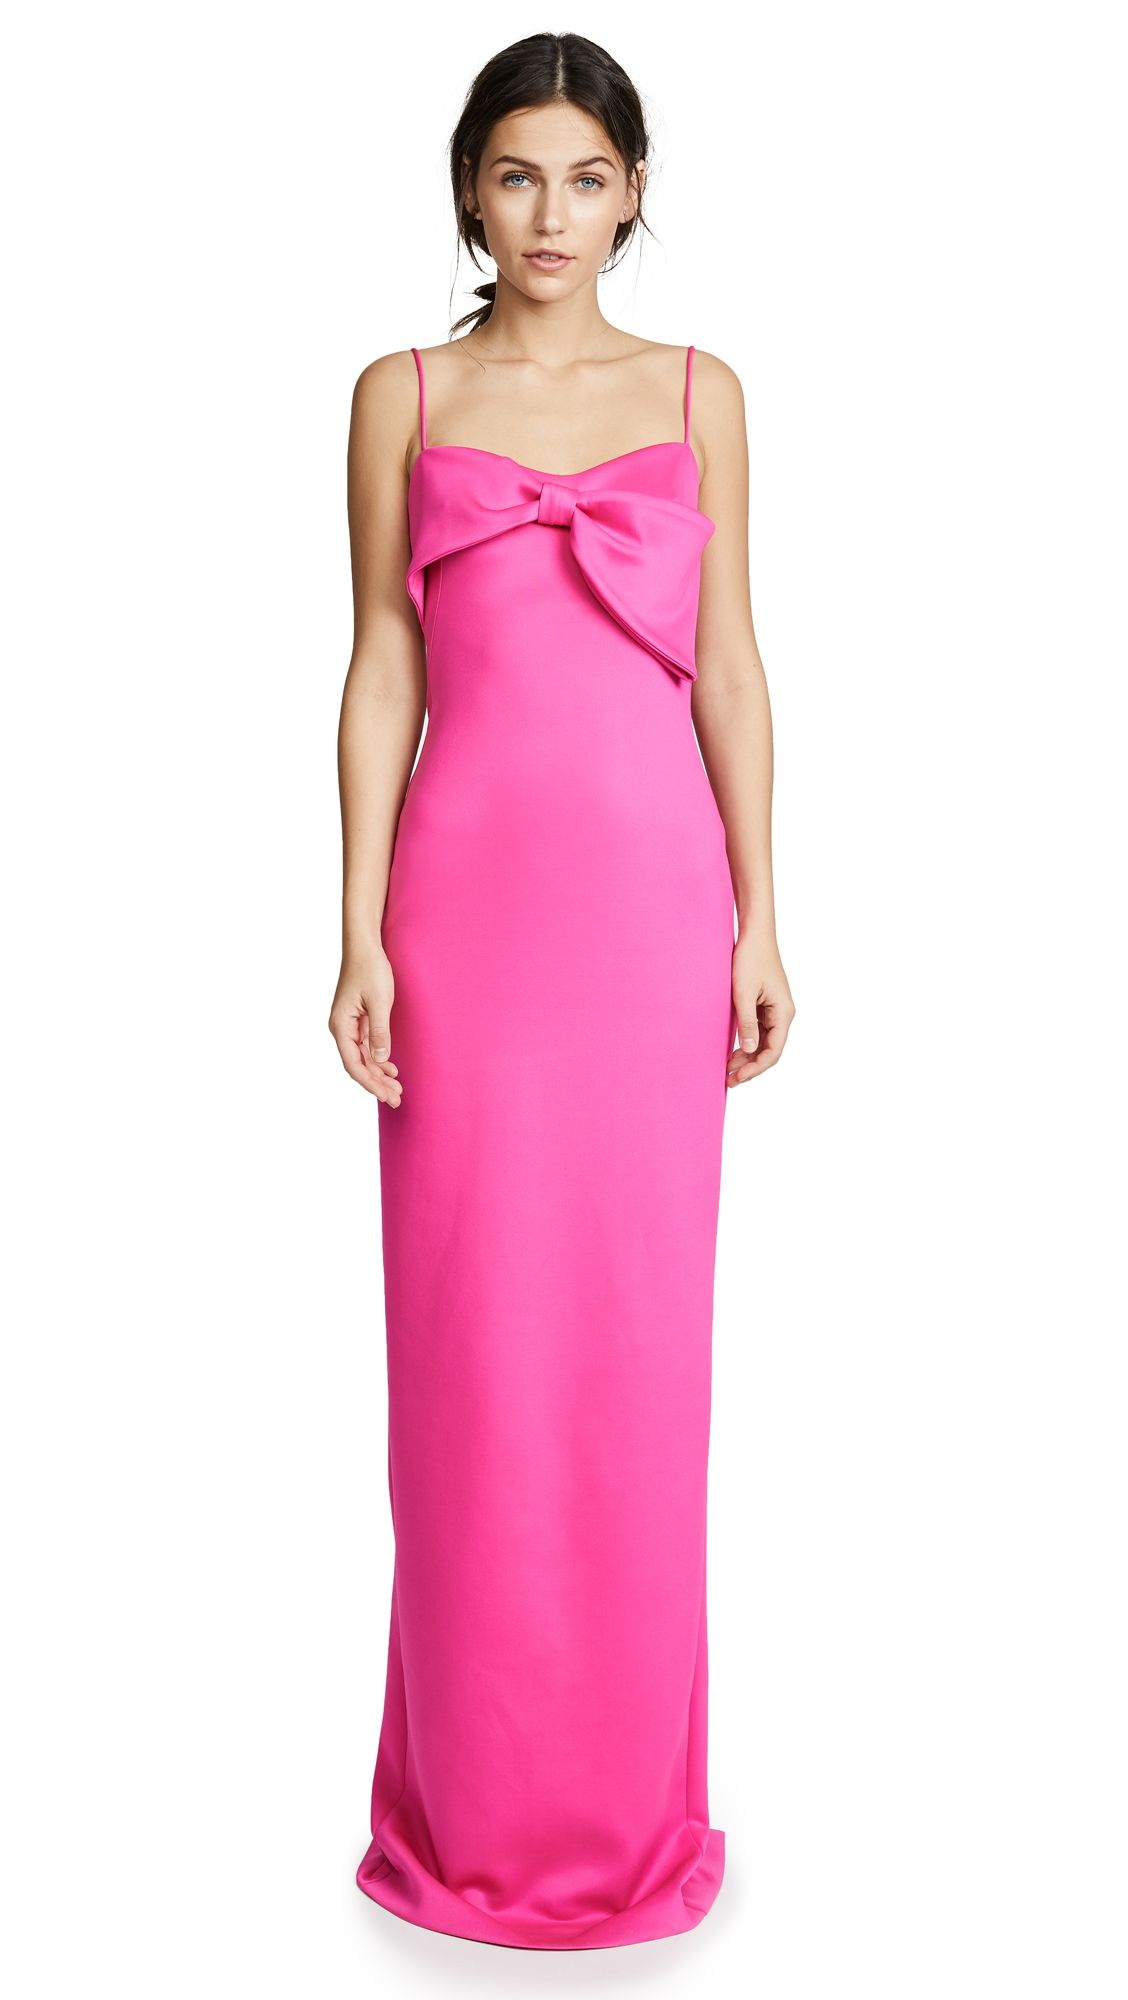 Monroe Sleeveless Column Gown W/ Bow Detail, Iconic Pink | Black ...